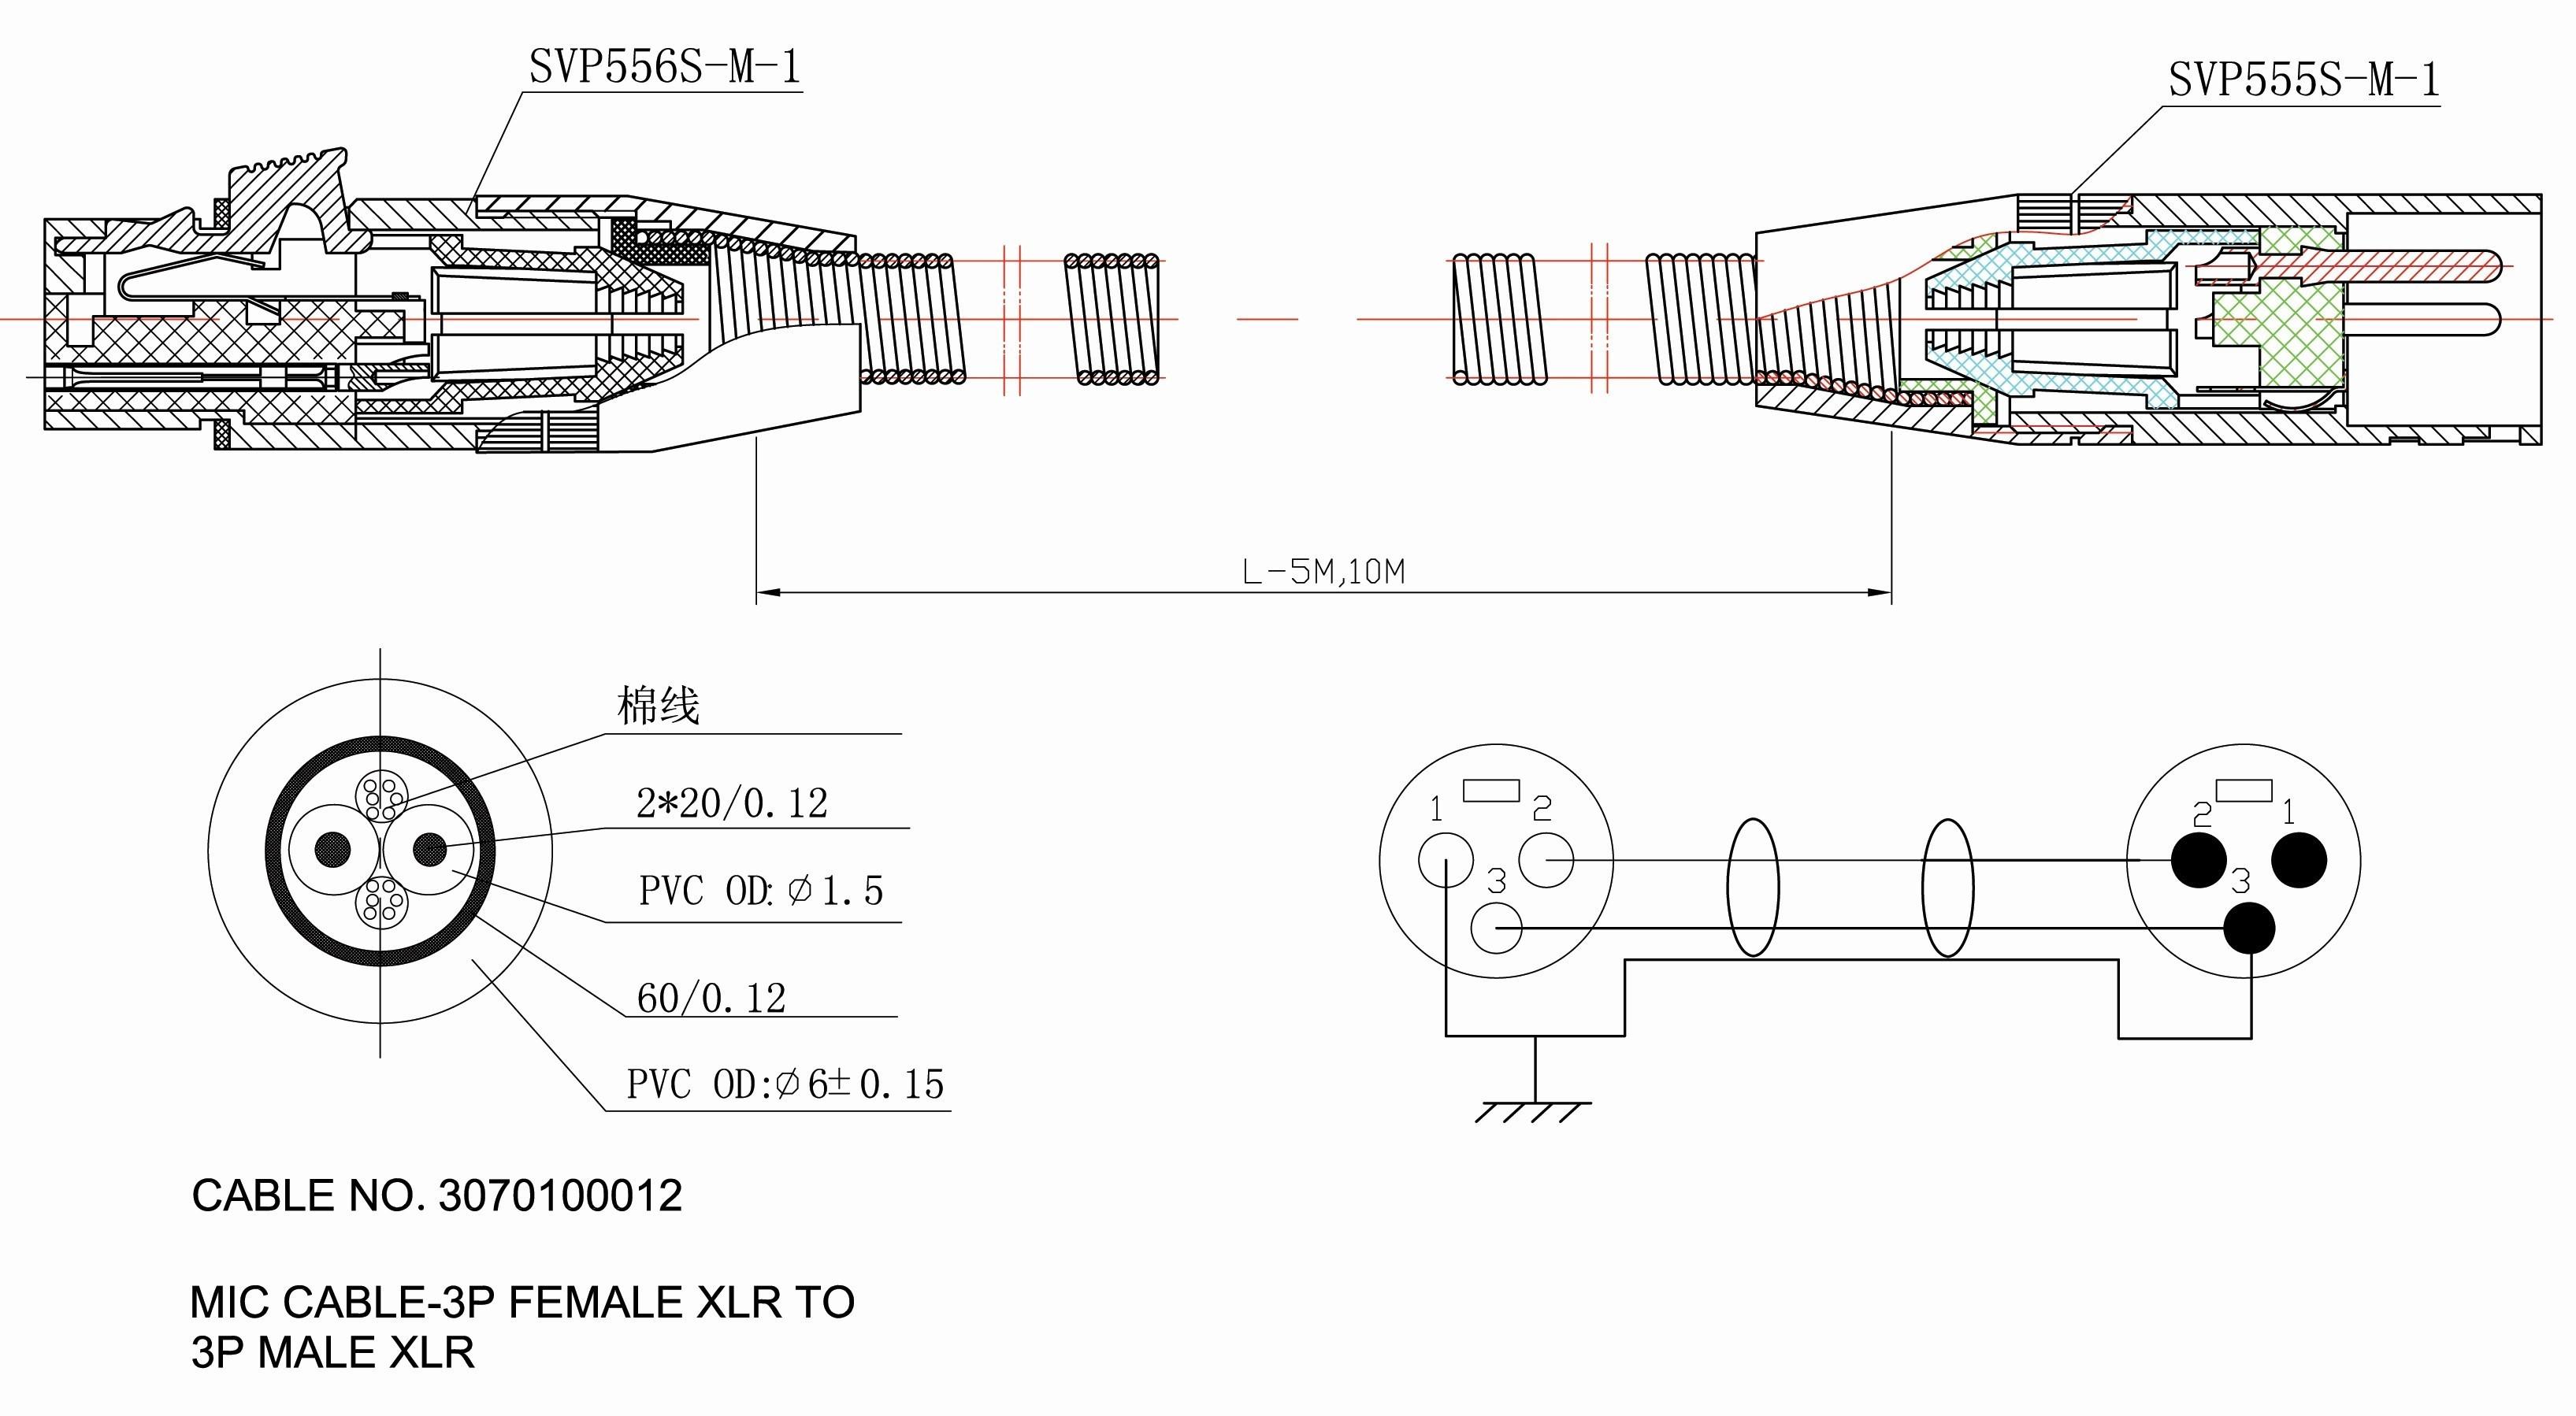 2003 Lexus Es300 Engine Diagram Twin Pair Rj11 Wiring Diagram Another Blog About Wiring Diagram • Of 2003 Lexus Es300 Engine Diagram